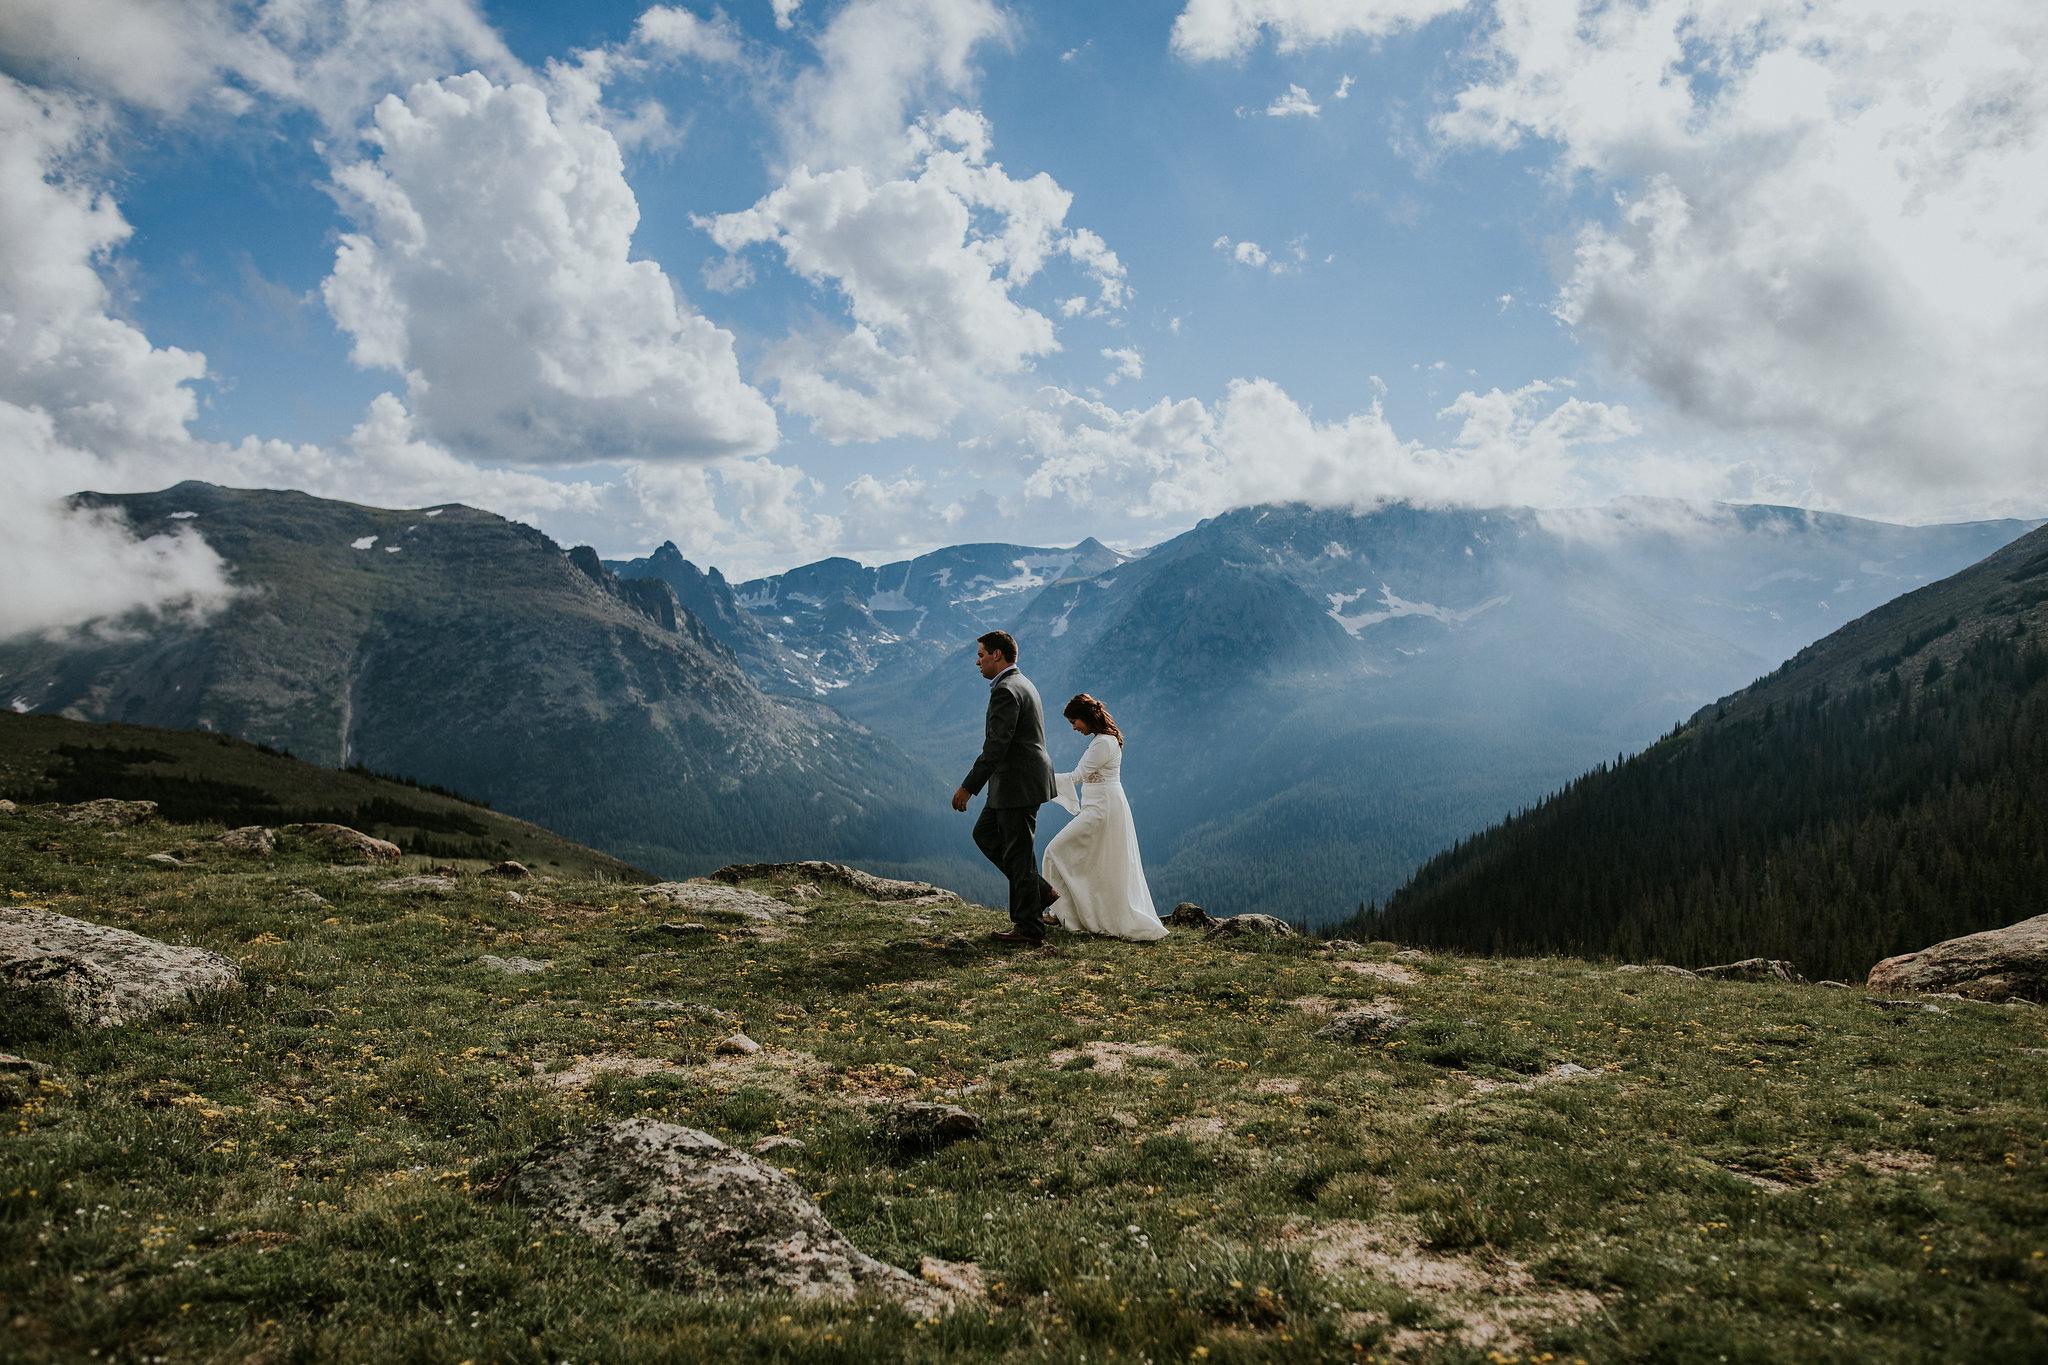 Elle + Ben   Rocky Mountain National Park   Colorado Elopement Photo + Video